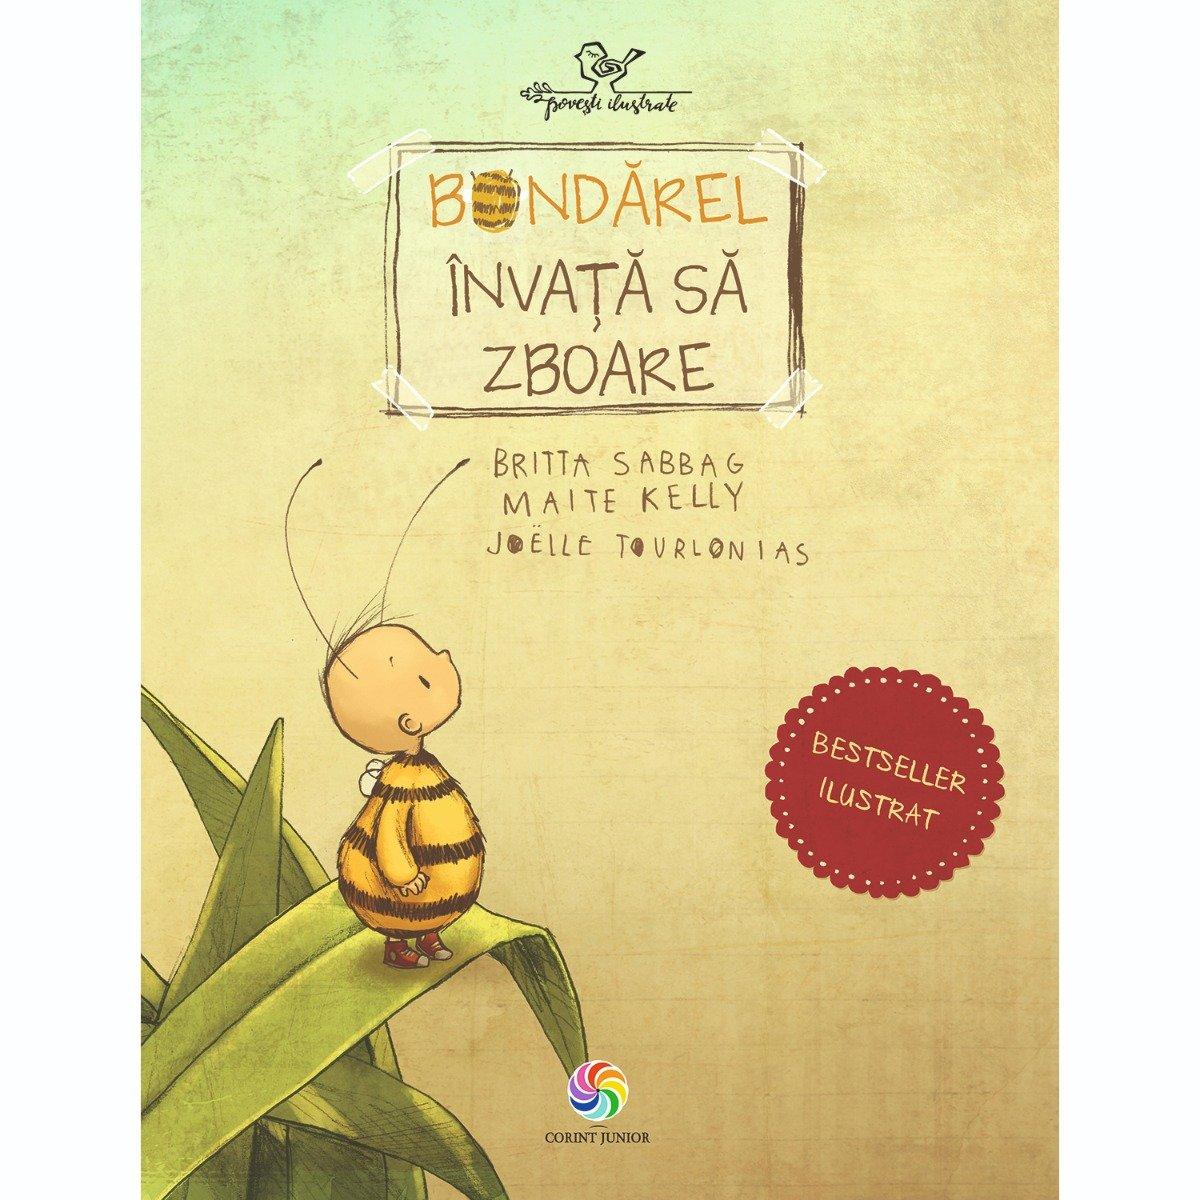 Carte Editura Corint, Bondarel invata sa zboare ed. II, Britta Sabbag, Maite Kelly, Joelle Tourlonais